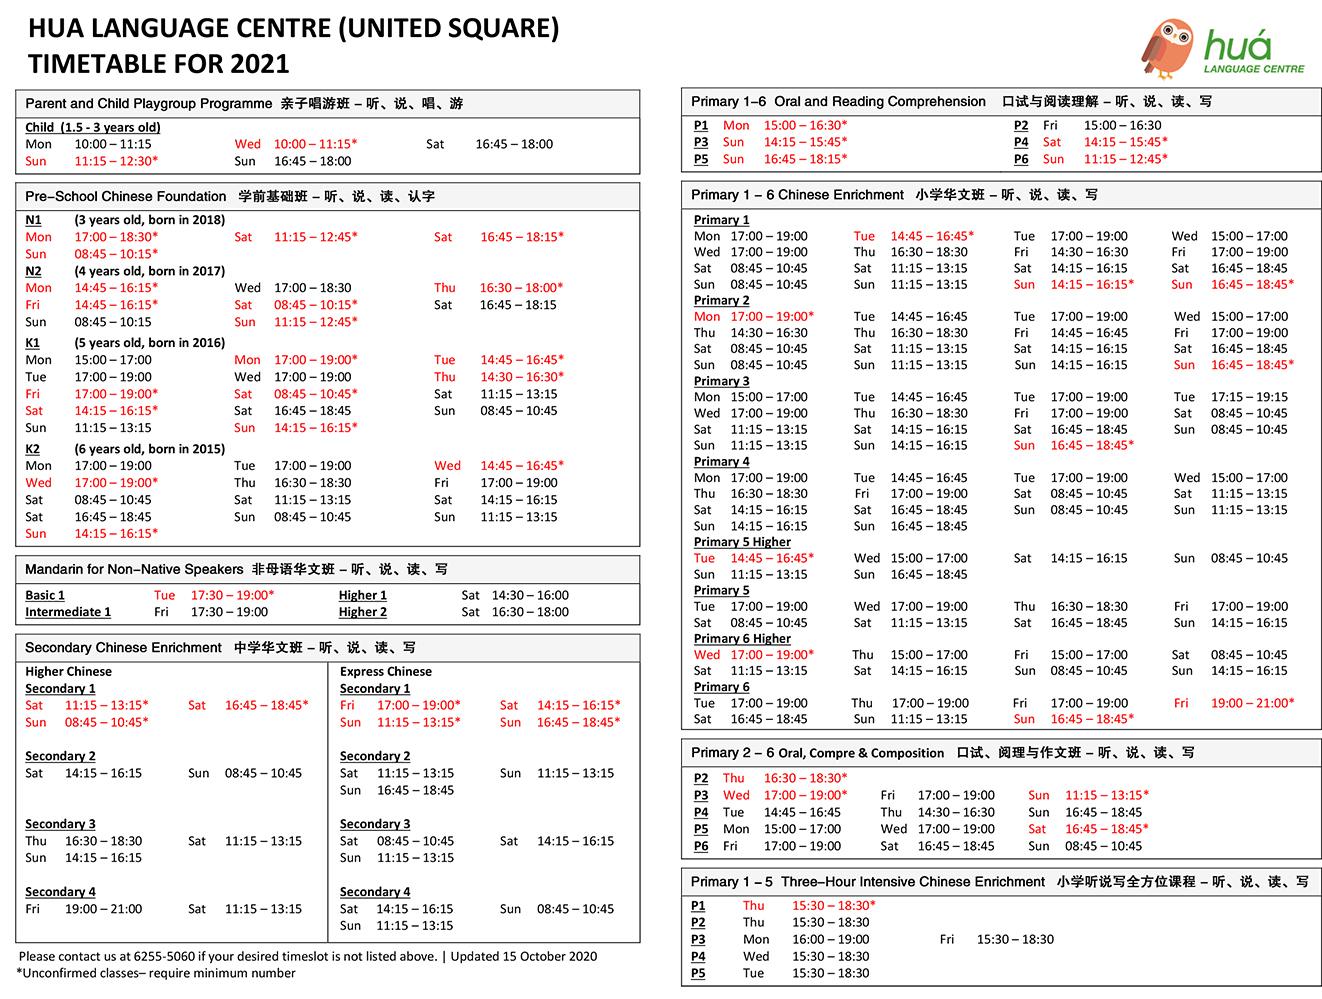 Hua Chinese Classes 2021 United Square Schedule